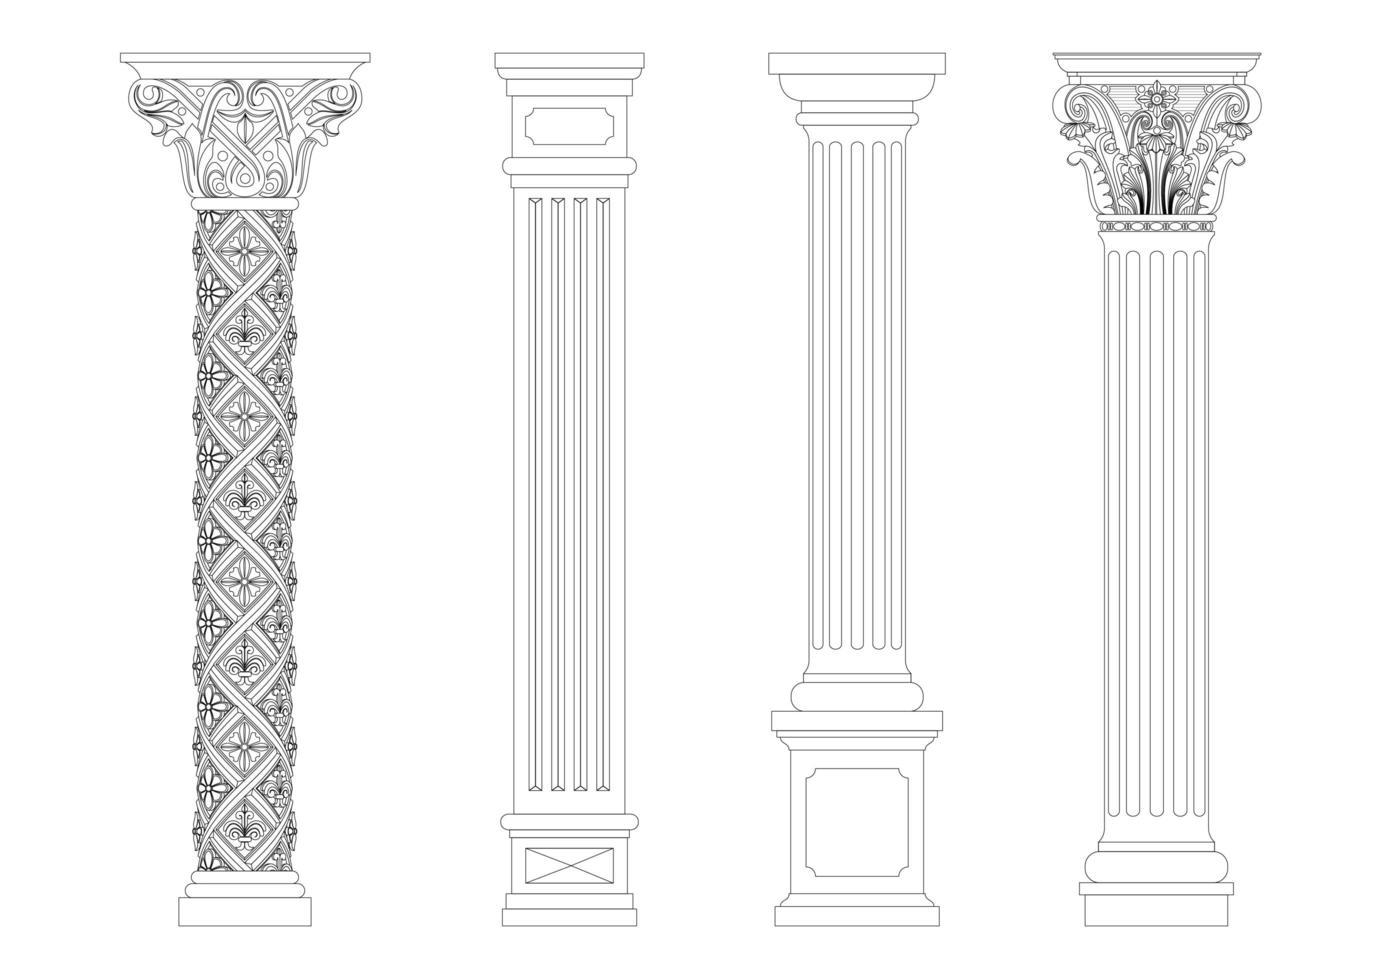 columnas clásicas en estilo de contorno vector